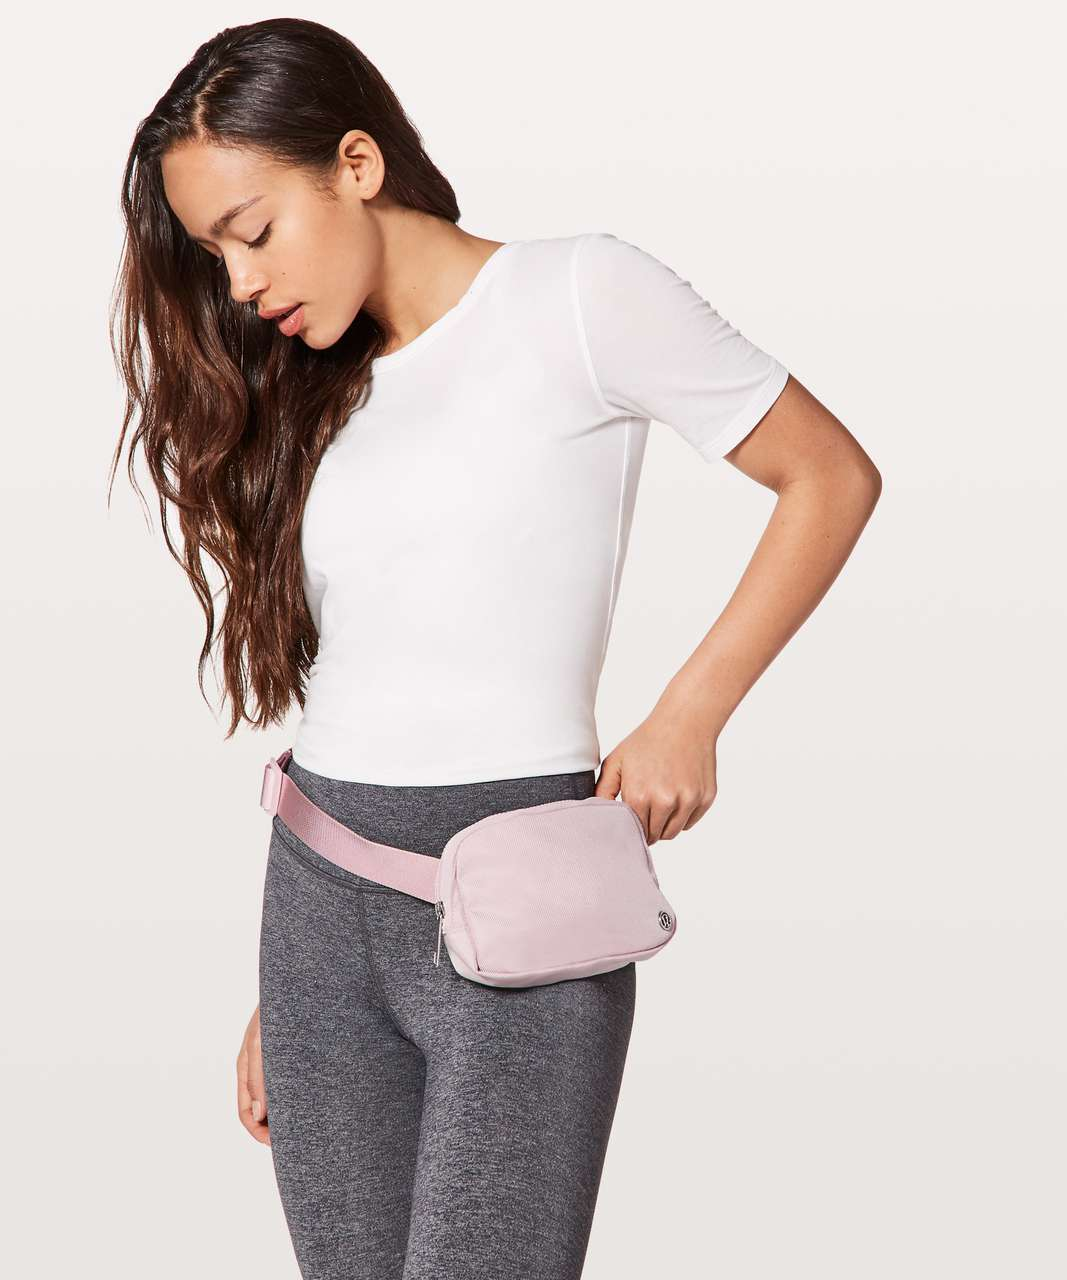 Lululemon Everywhere Belt Bag *1L - Misty Pink